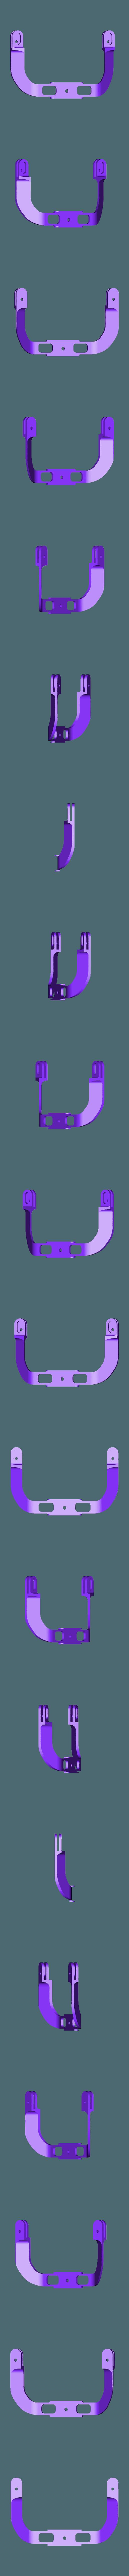 Ender_3_Pro_Bed_Handle_V3_-_Tripod_Mount_-_Box25.0mm.stl Download free STL file ADKS - Ender 3 Bed Handle with action cam mount • Template to 3D print, Adarkstudio